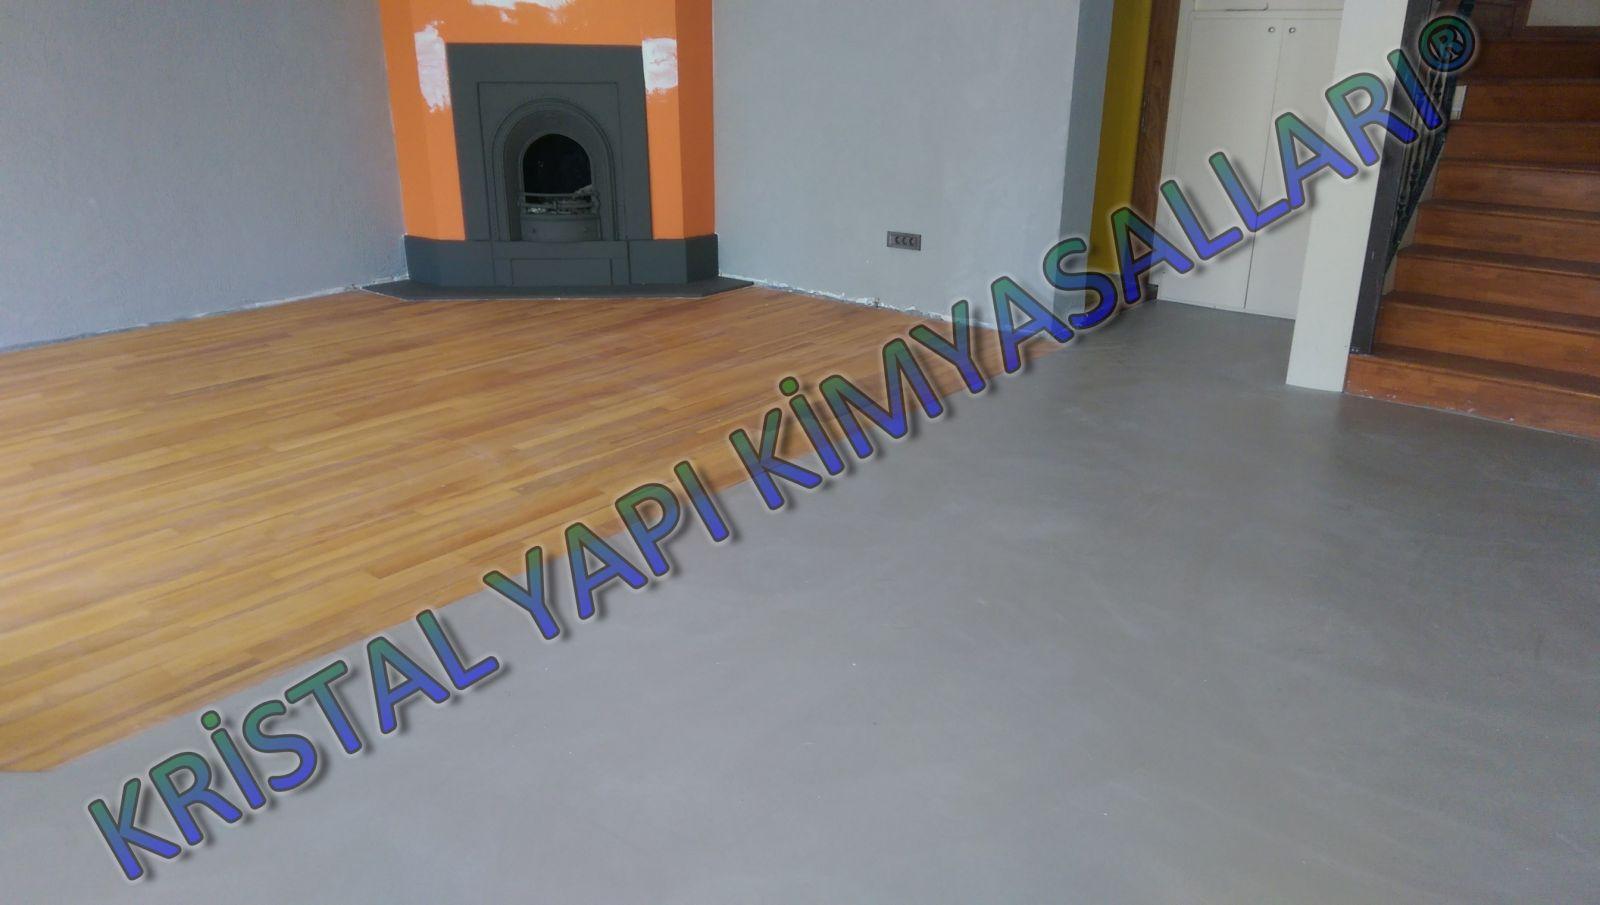 micro+beton+uygulaması+flooropal+mflex+levent, micro+beton+flooropal+mflex+fiyatları